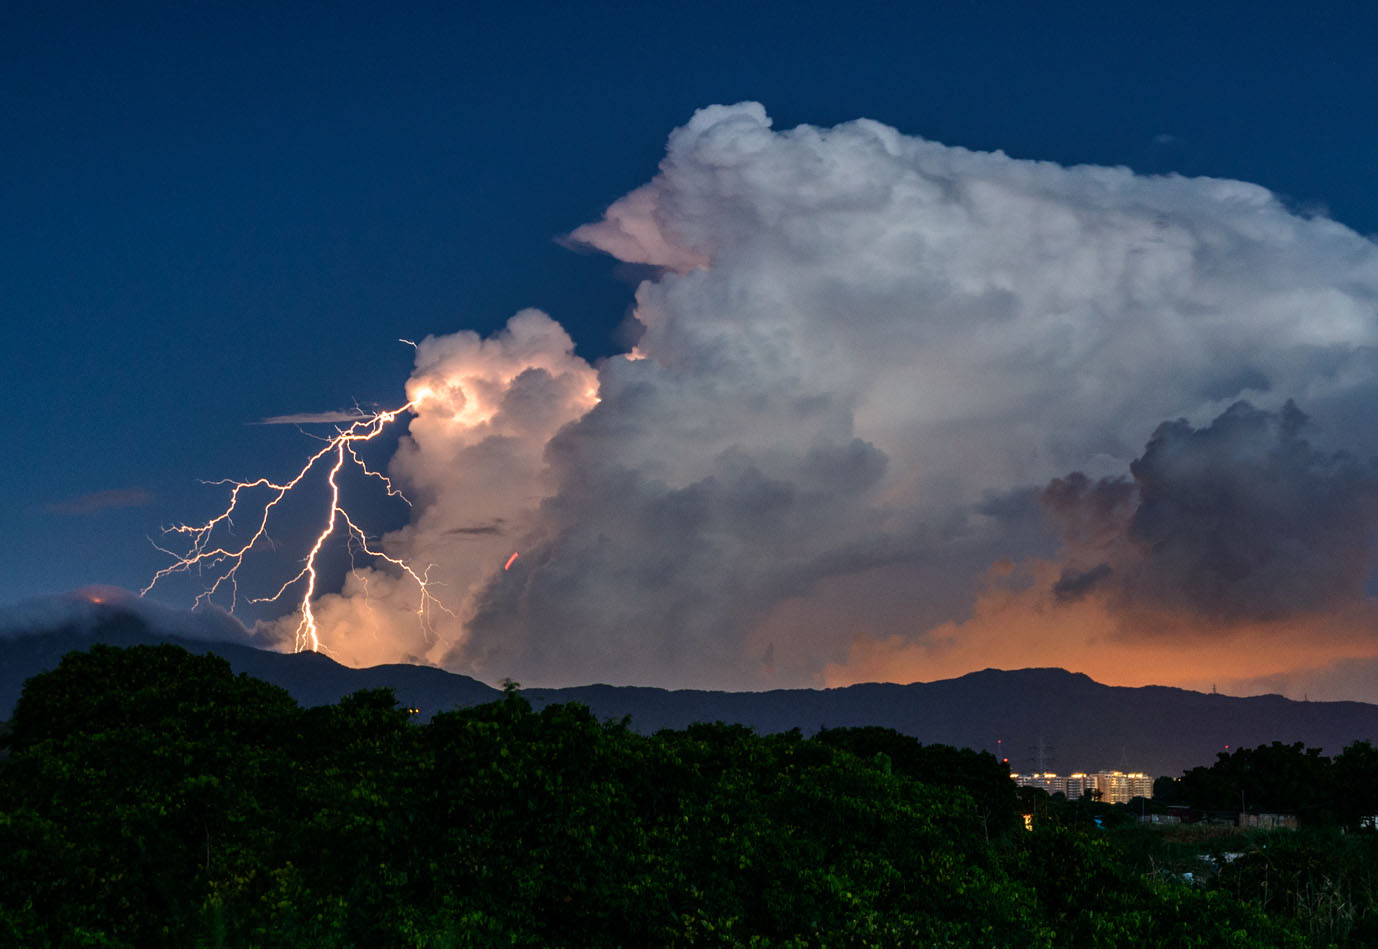 Wyładowanie z chmury Cumulonimbus; F. Sung Lok Cheung (źródło: https://cloudatlas.wmo.int/en/search-image-gallery.html).